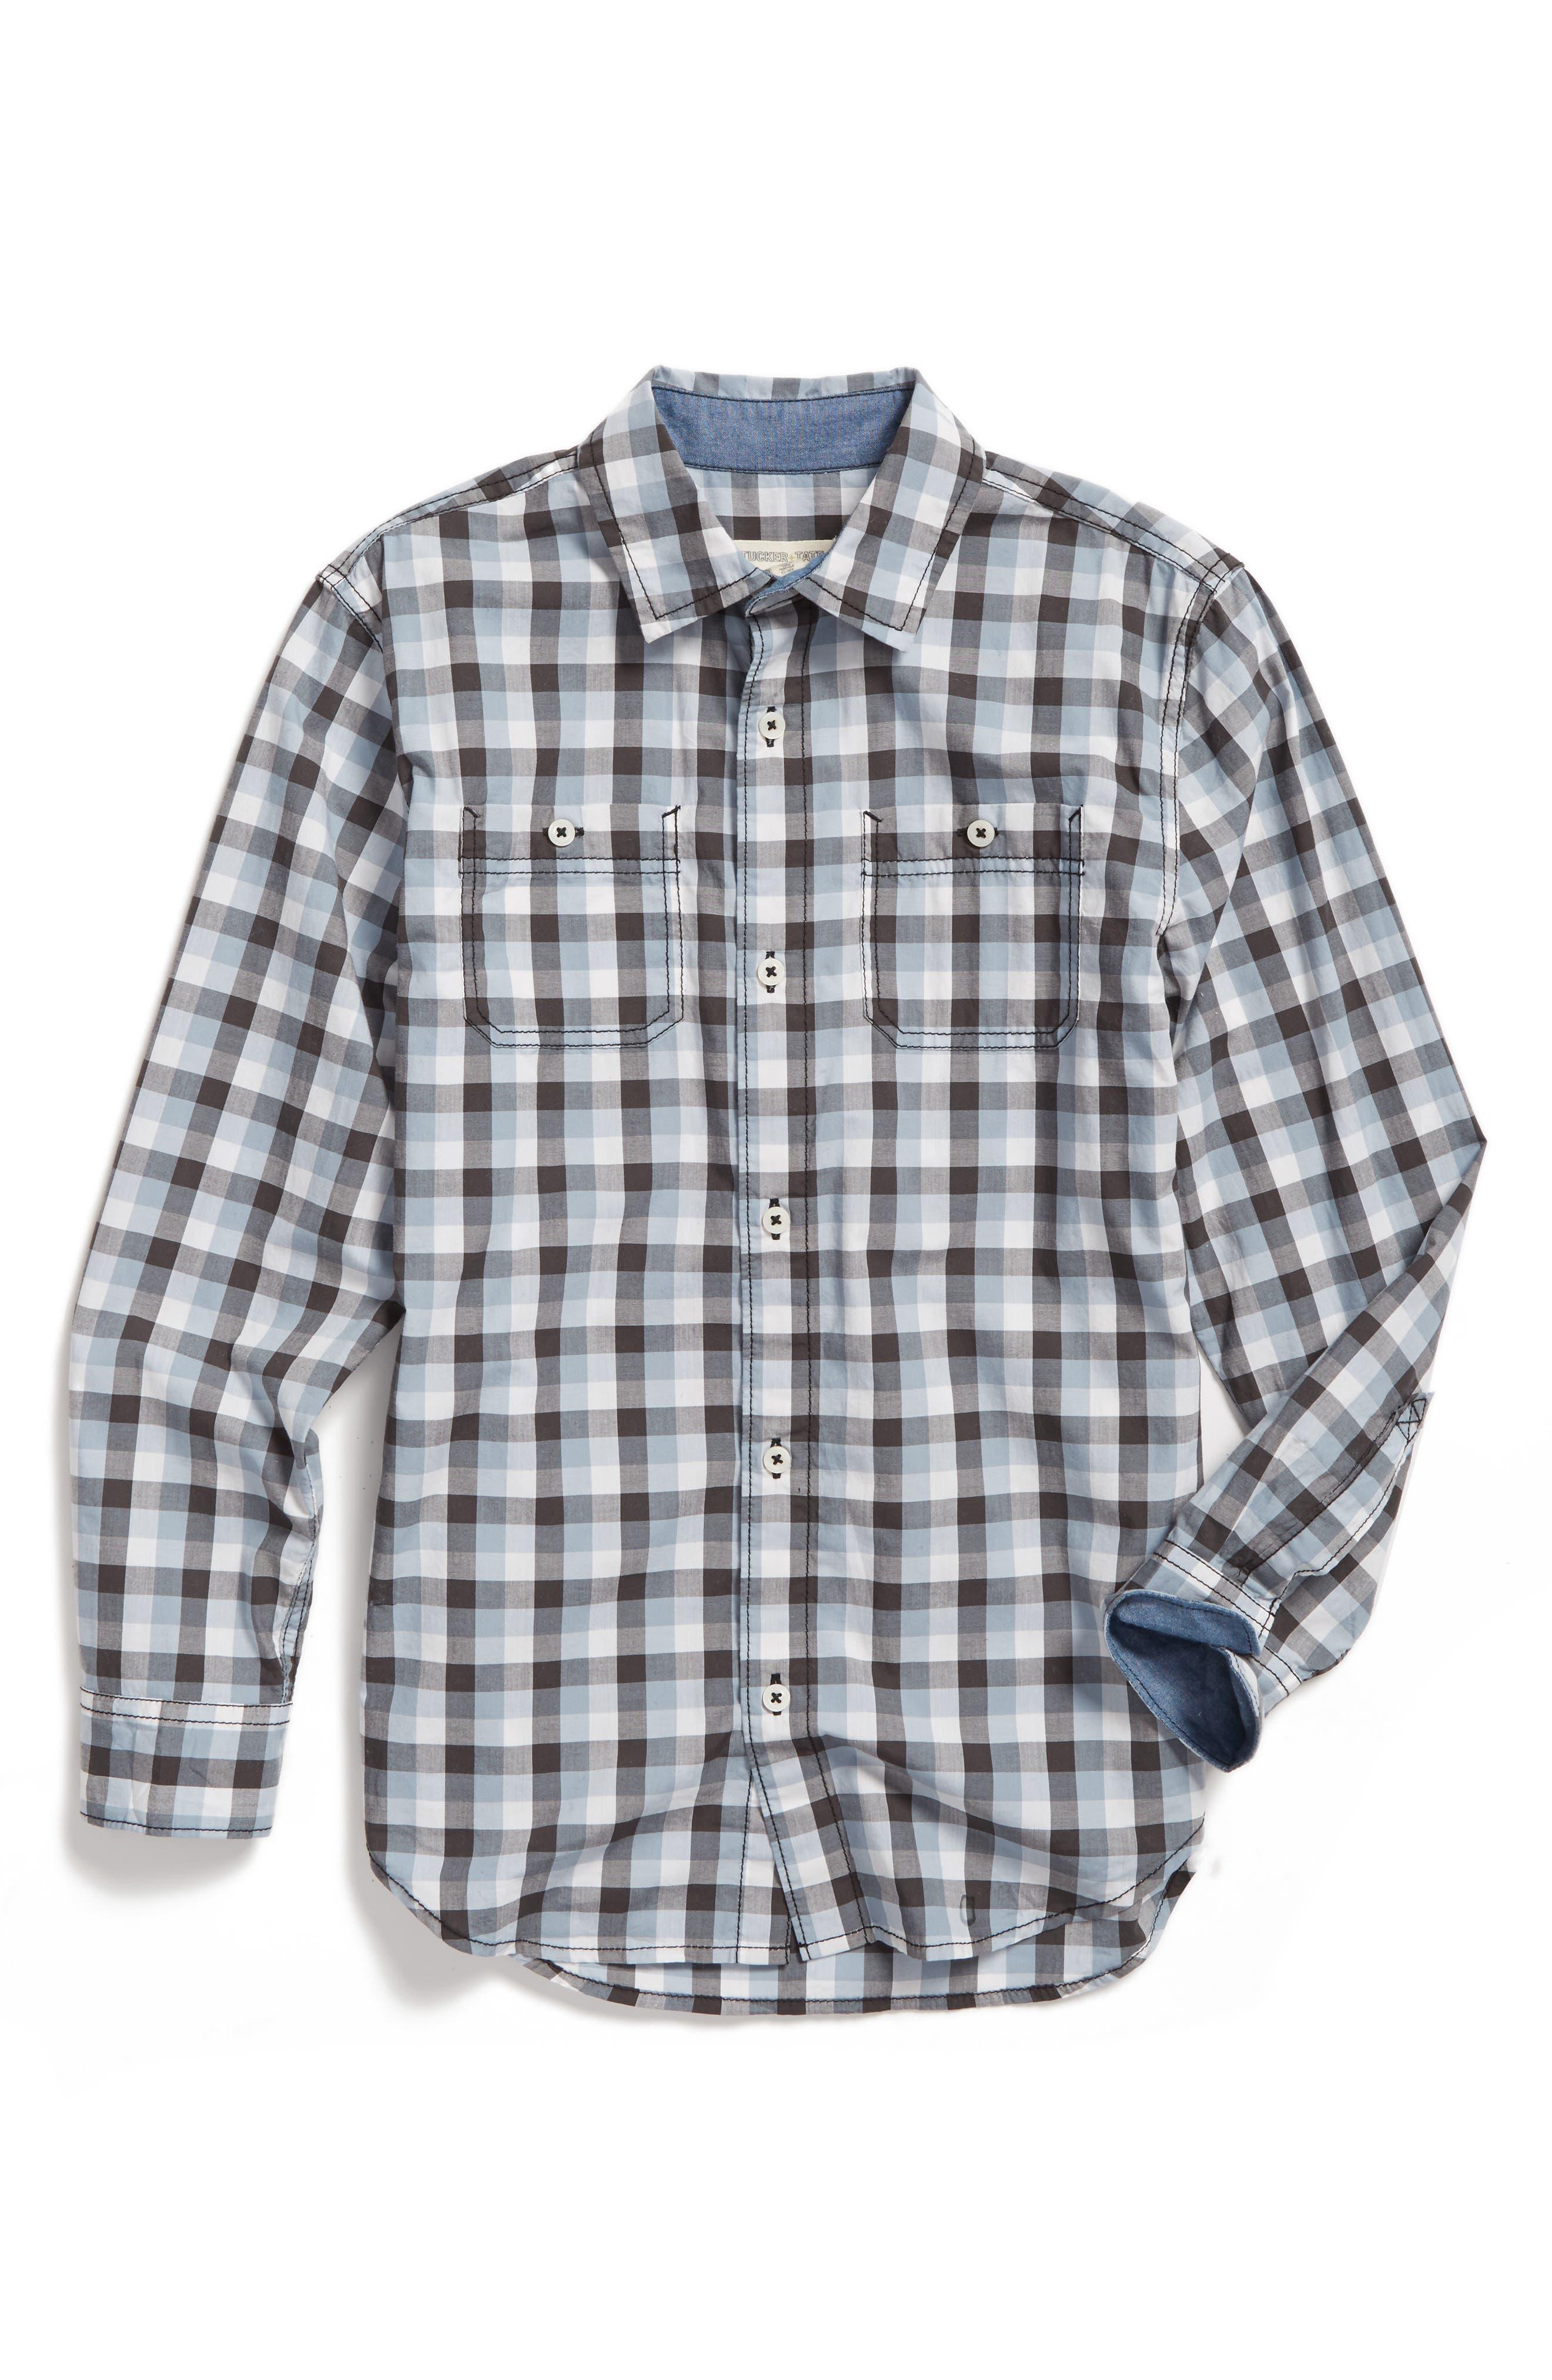 Main Image - Tucker + Tate 'Photo Op' Long Sleeve Cotton Woven Shirt (Big Boys)